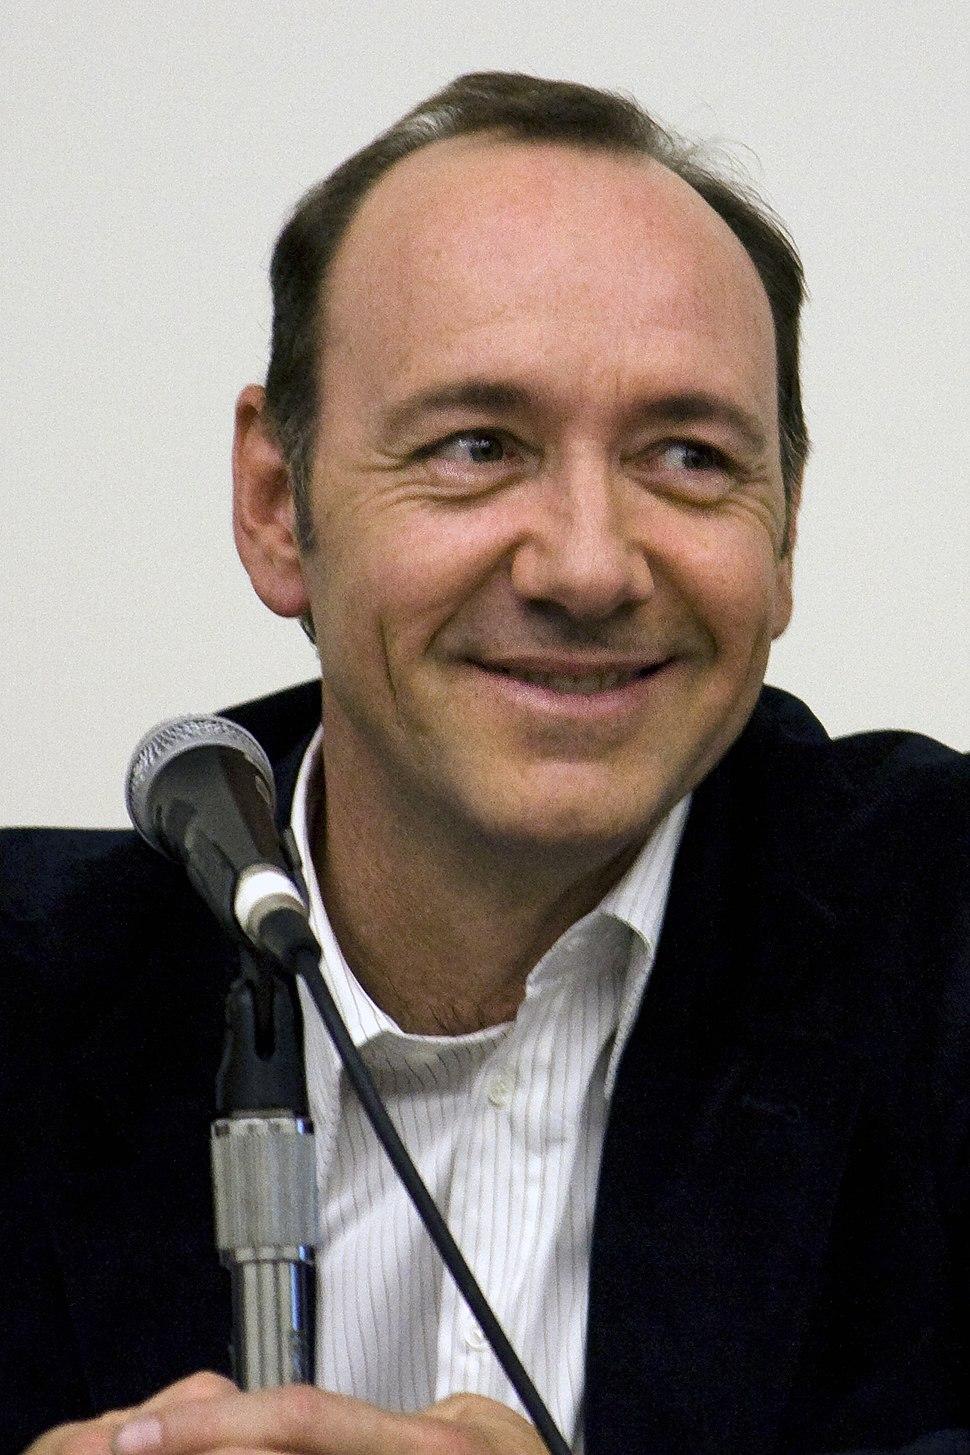 Kevin Spacey @ San Diego Comic-Con 2008 - b